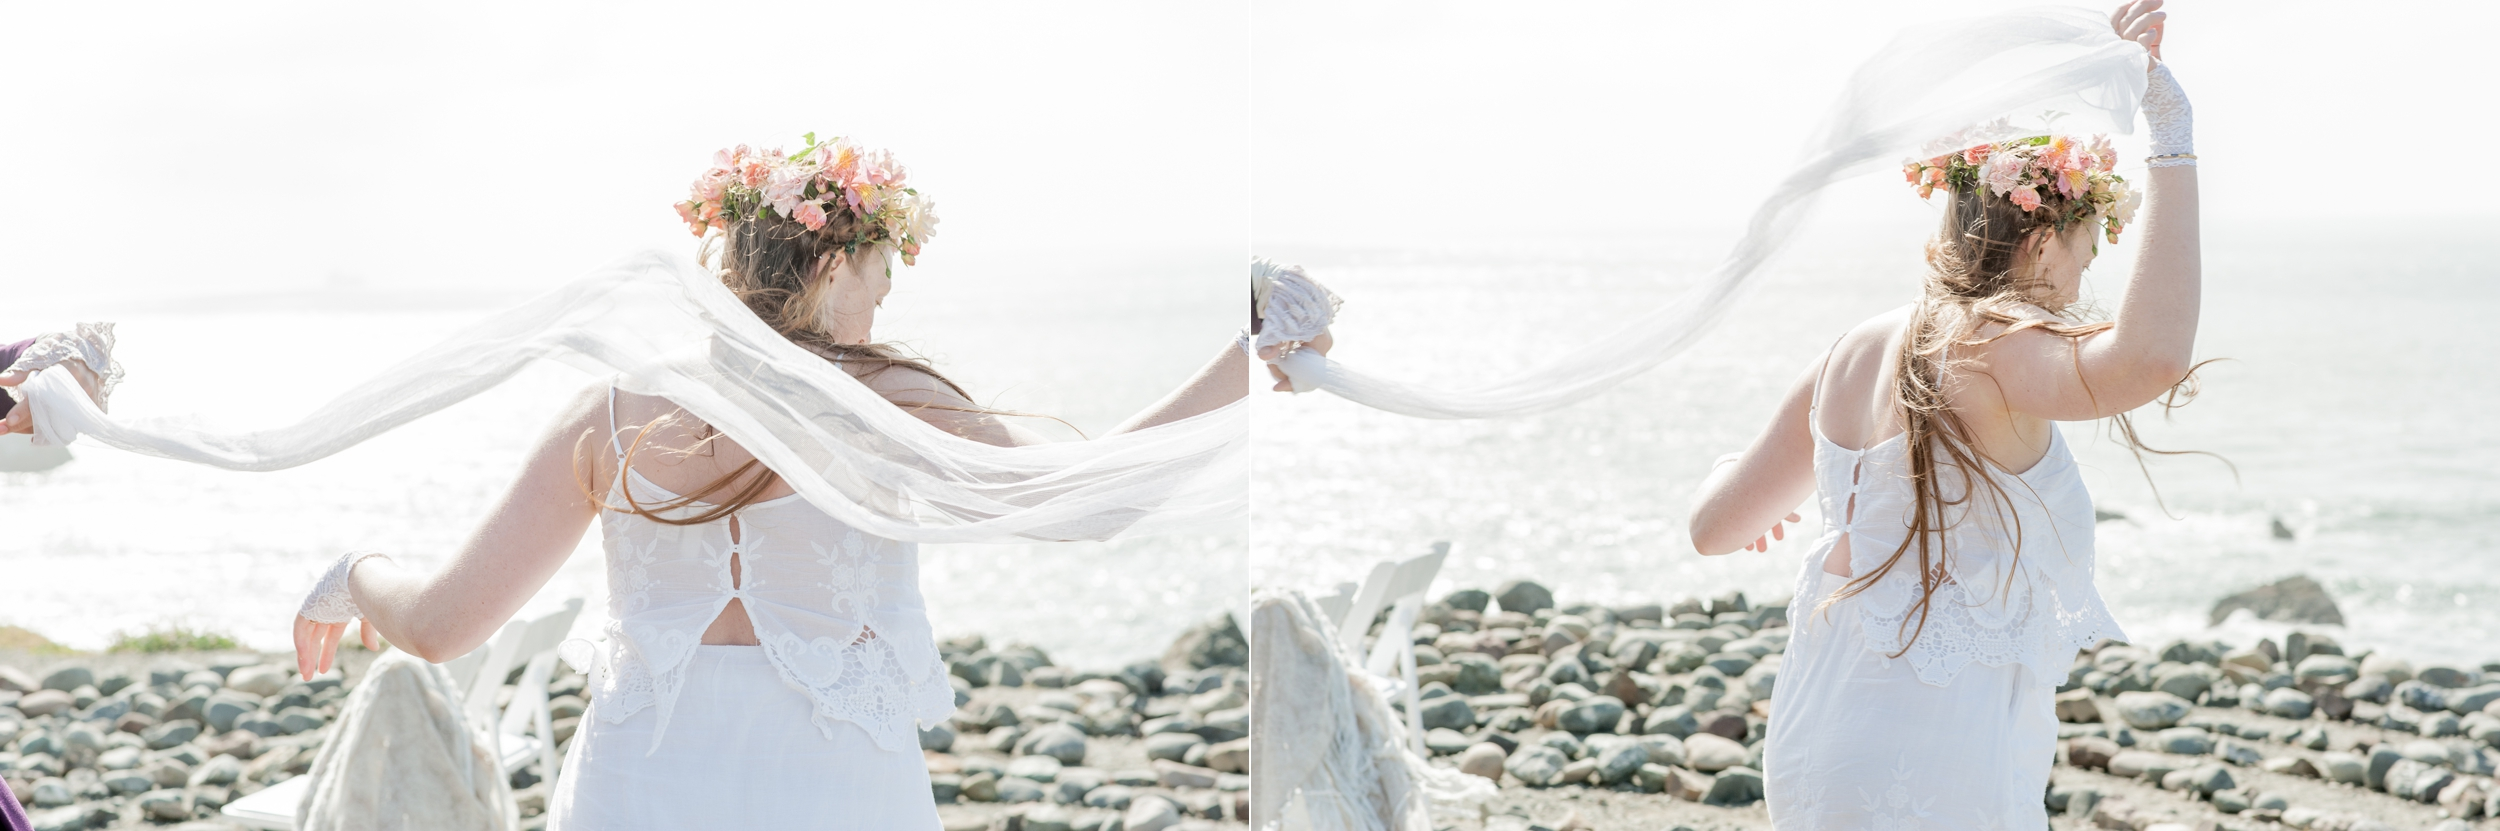 intimate-lands-end-labyrinth-san-francisco-wedding-44_WEB.jpg